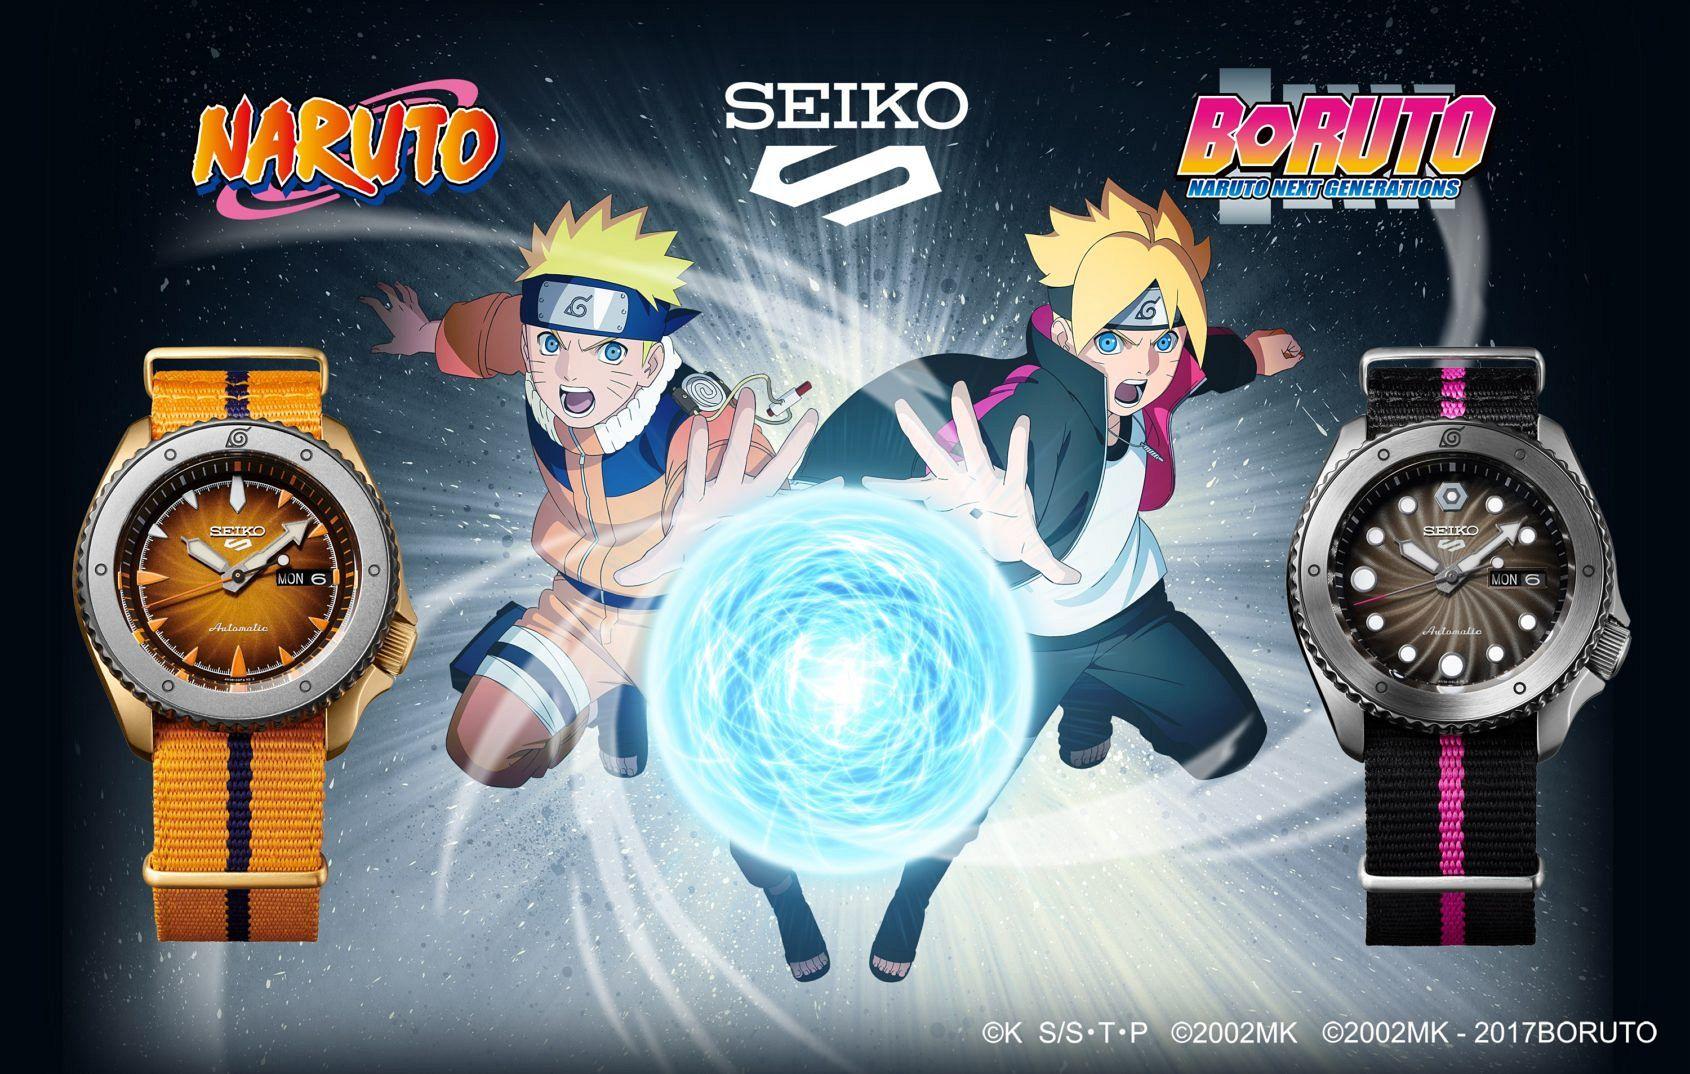 Stealth-help: Seiko creates kick-ass new collection inspired by Naruto's anime ninjas